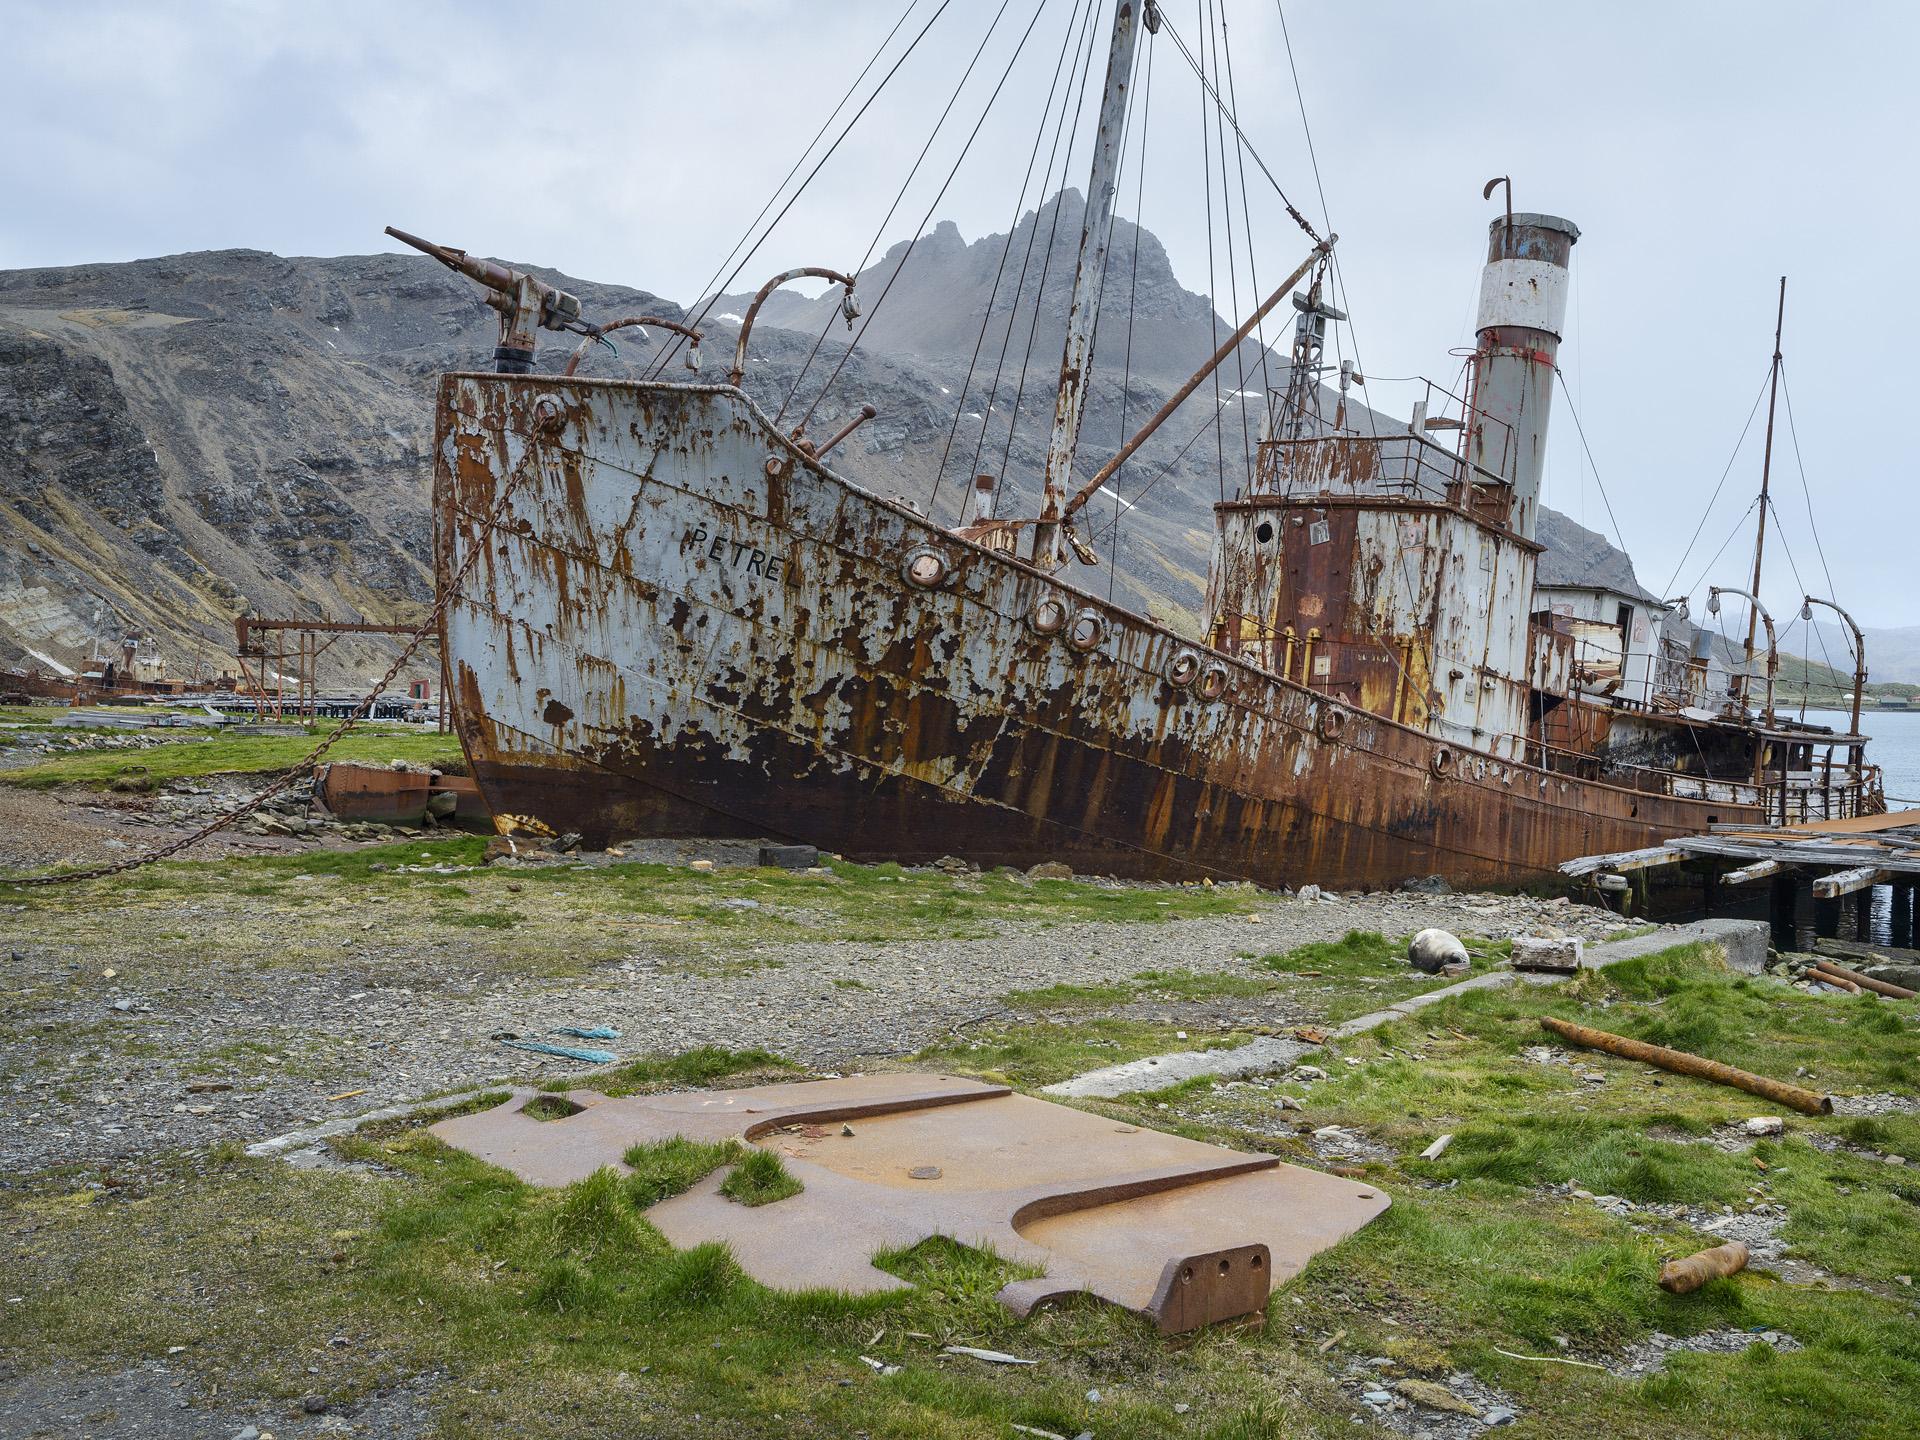 Old Whaler, Grytviken, South Georgia, Antarctica 2016